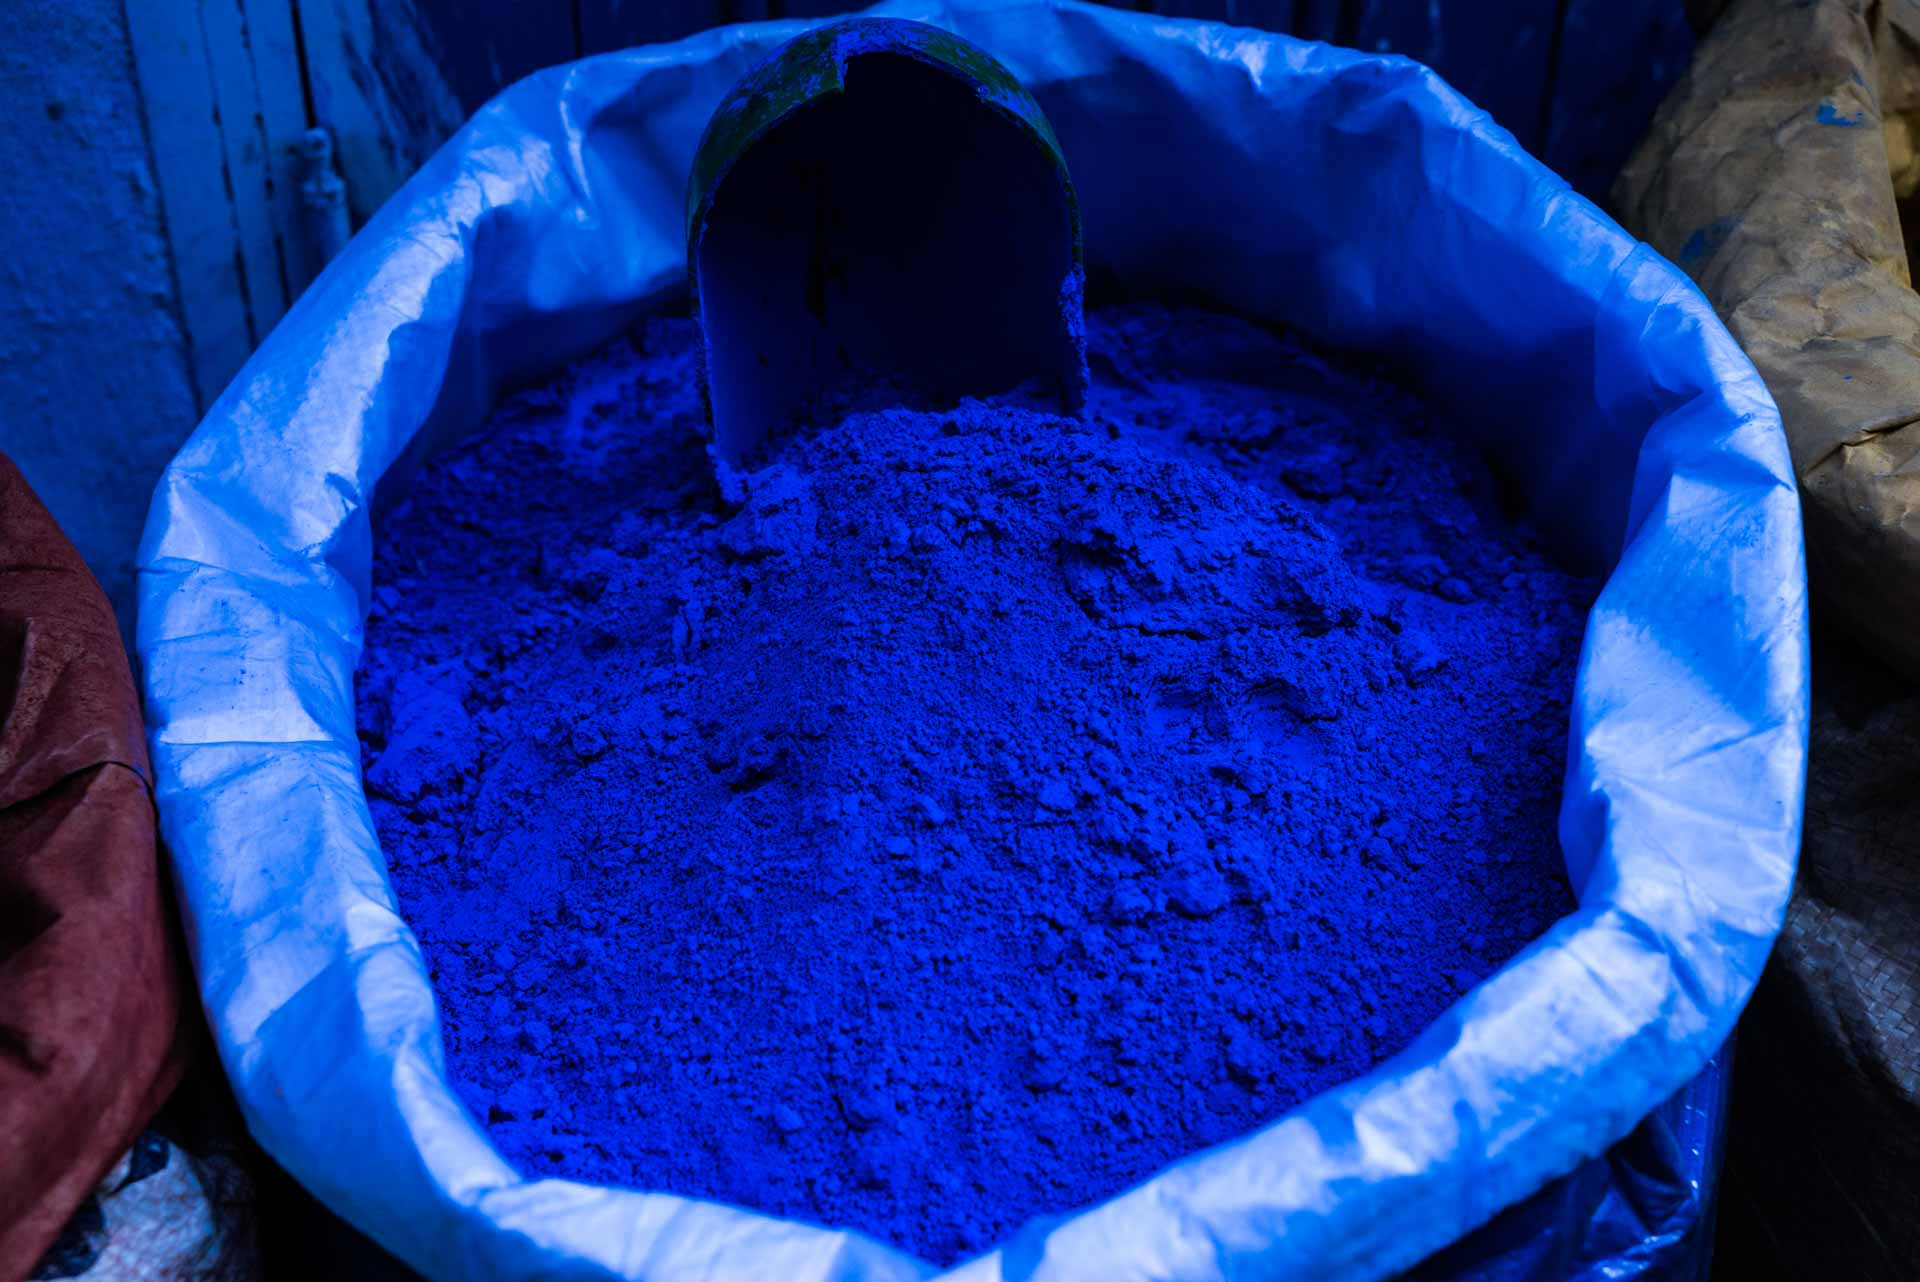 Morocco Chefchaouen blue powder